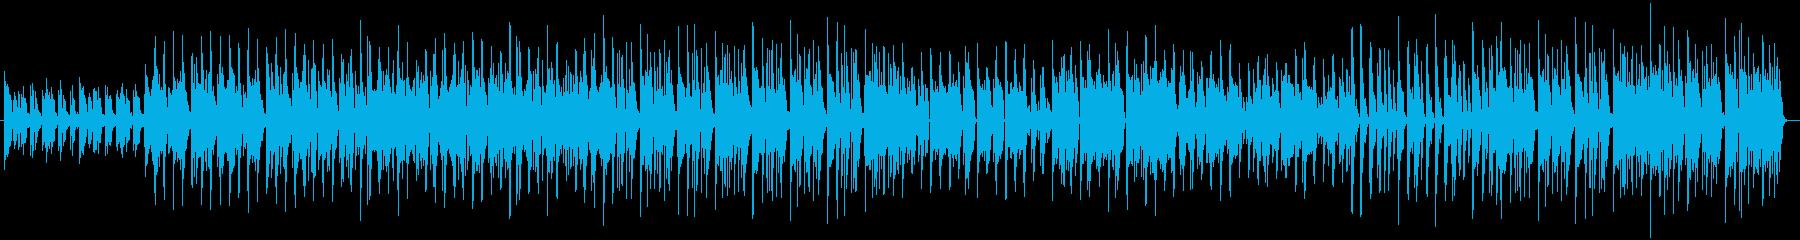 CoolでFunkな曲調 Ver.2の再生済みの波形